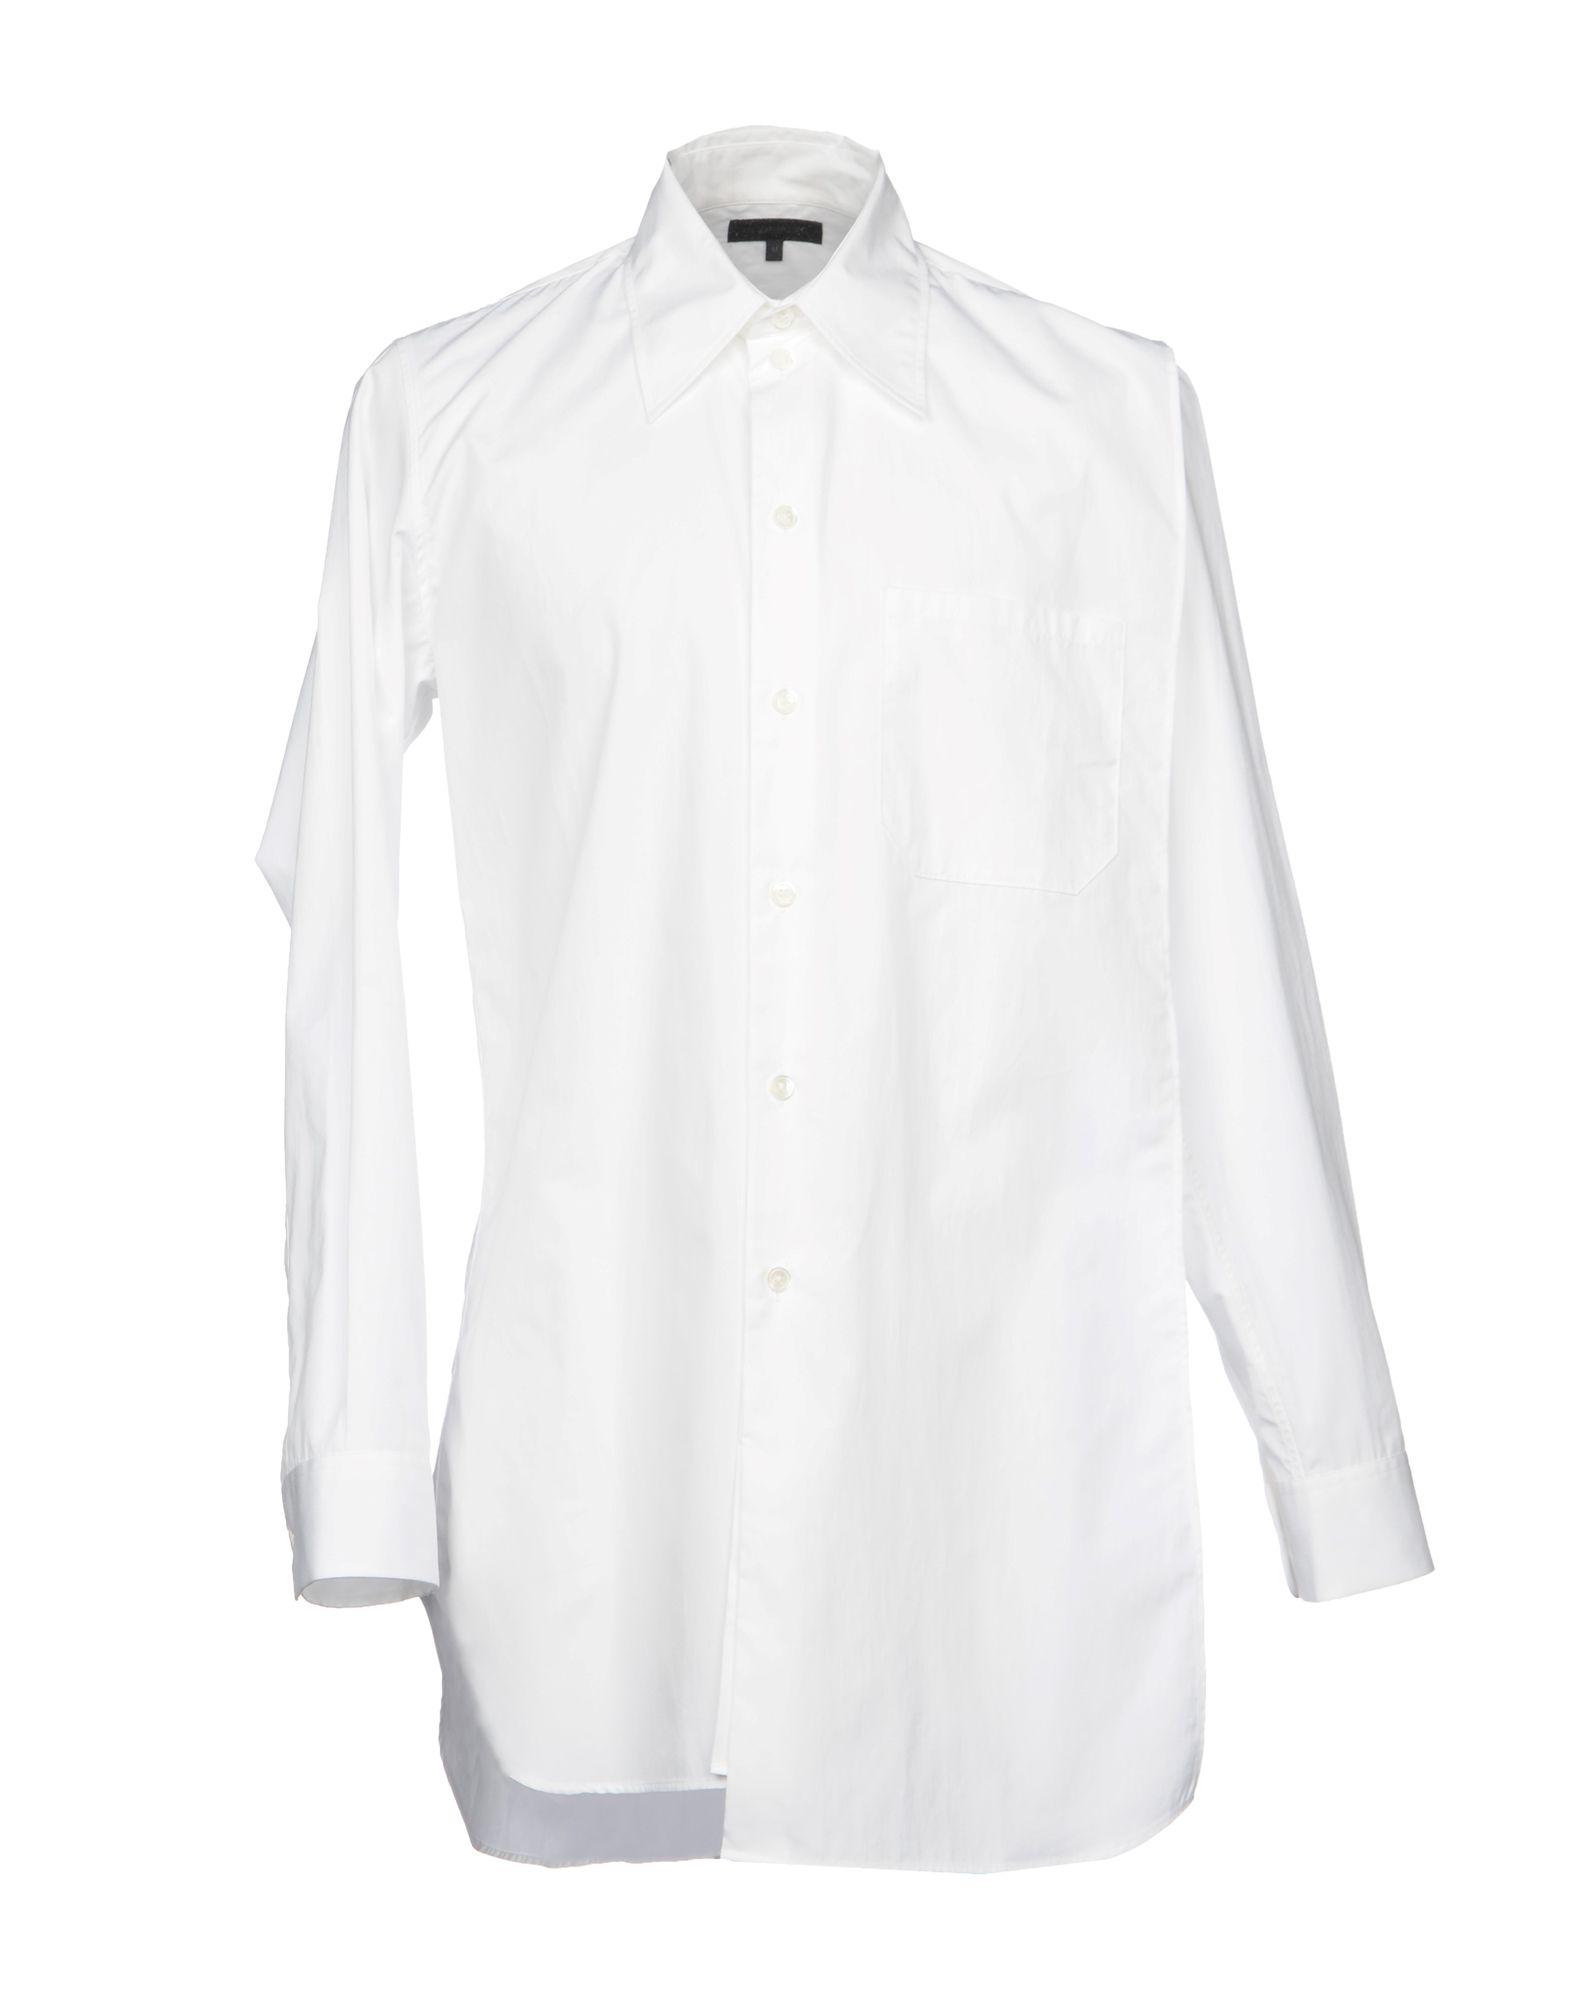 Camicia Tinta Unita Ann Demeulemeester Uomo - Acquista online su